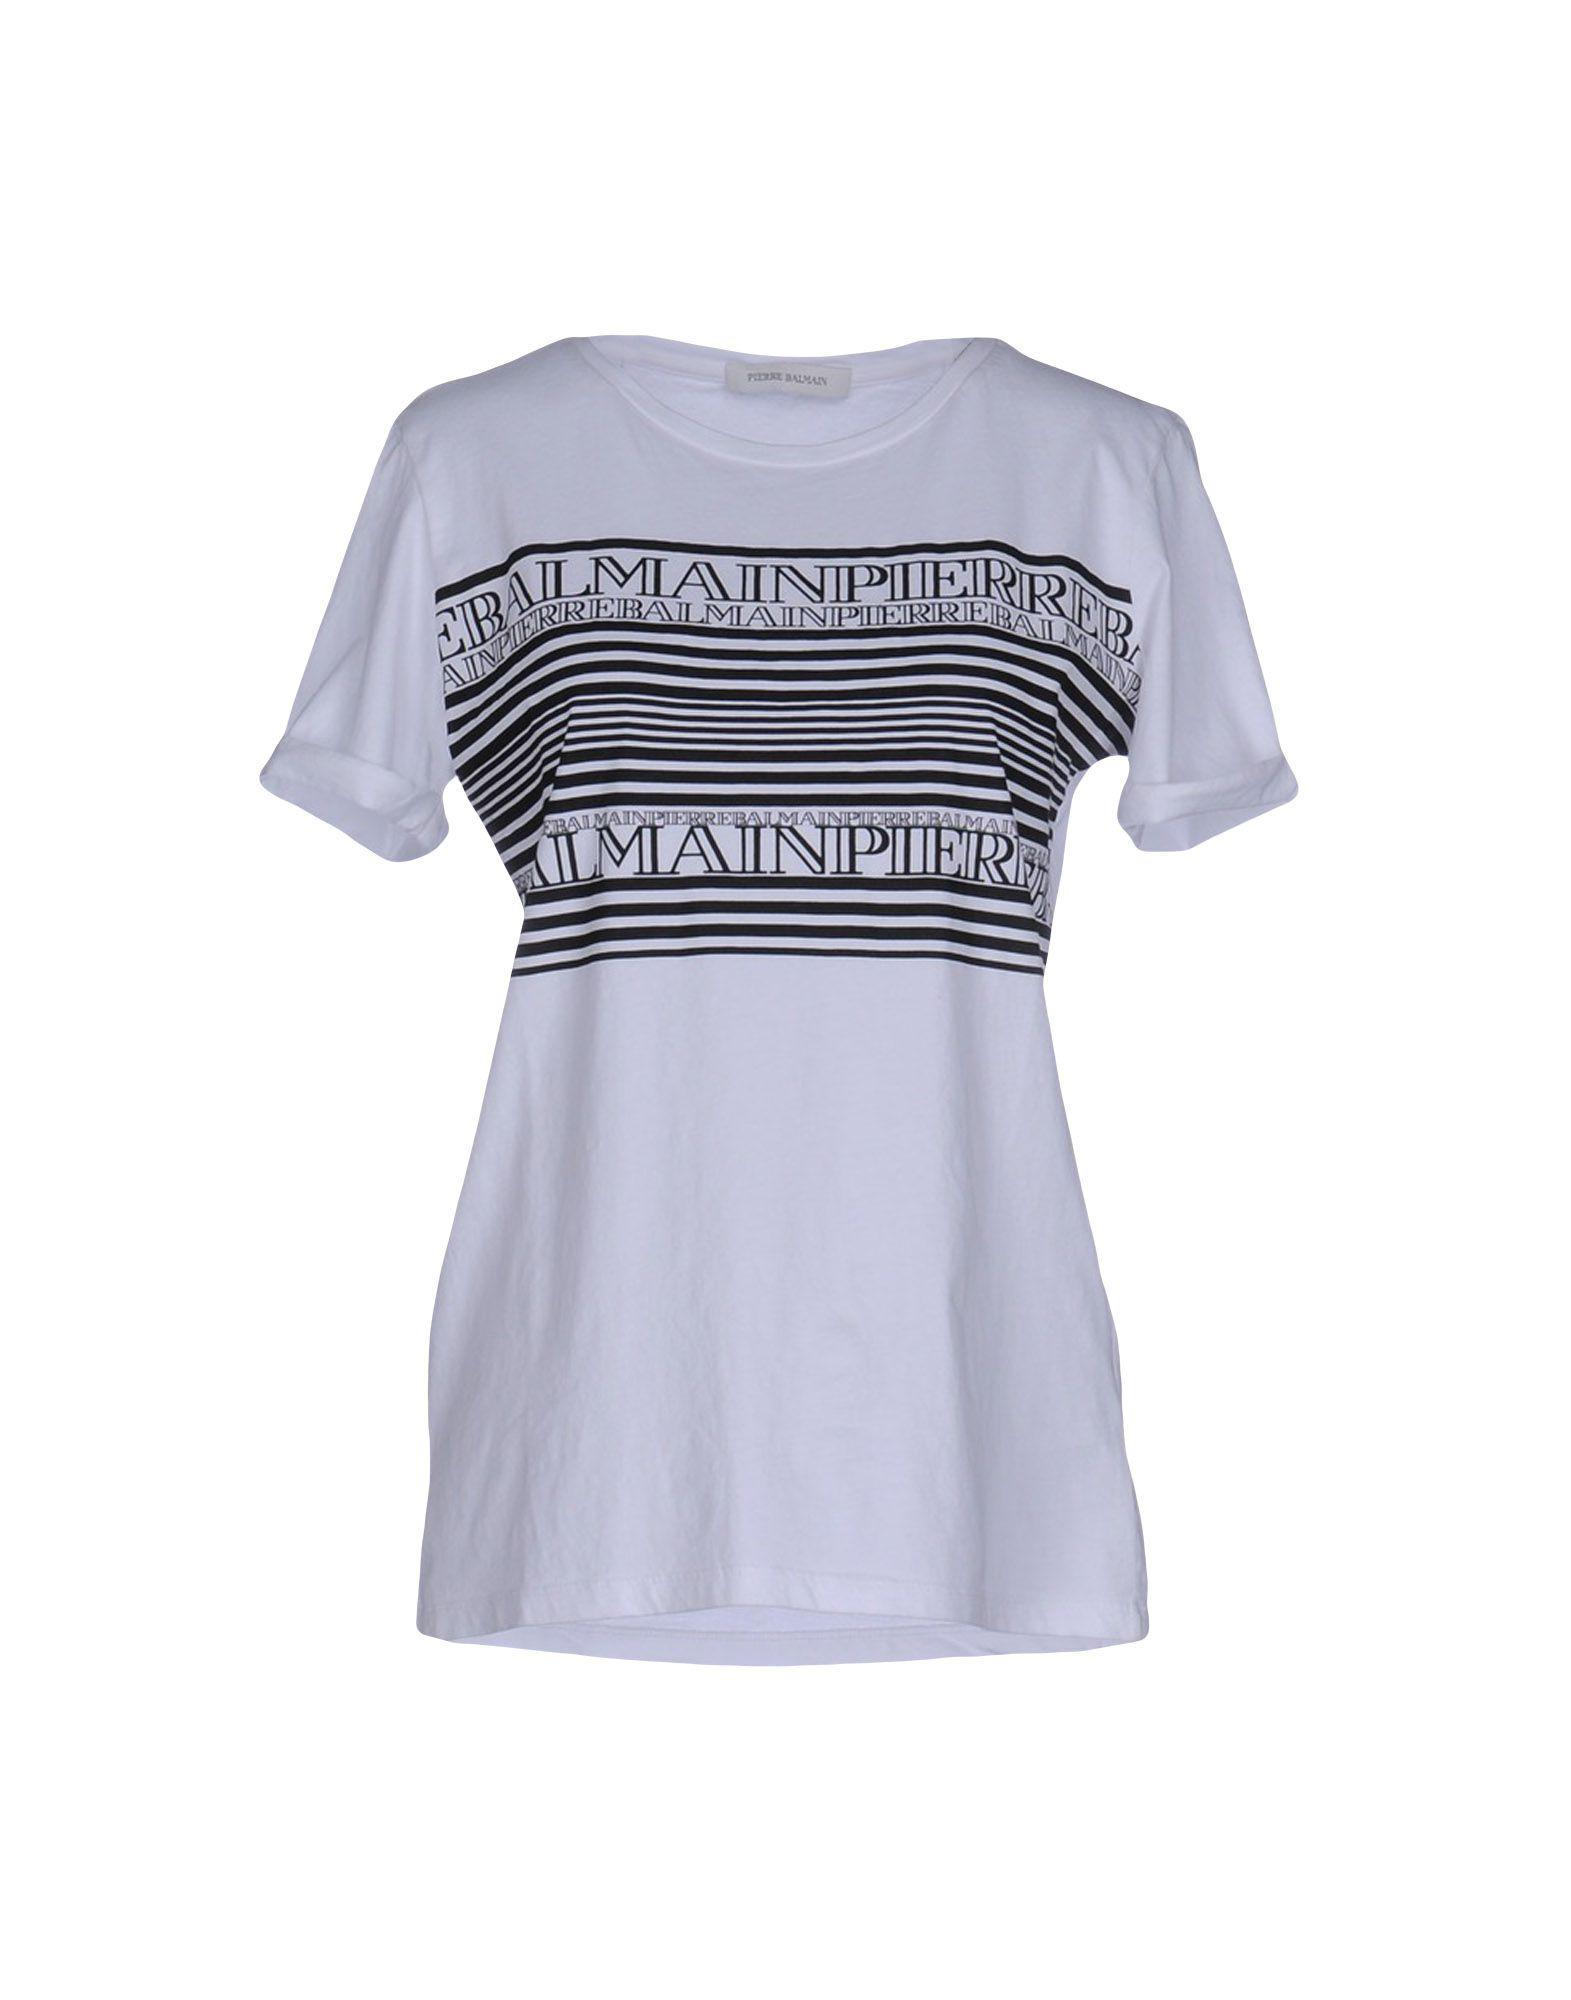 Lyst balmain t shirt in white for Balmain white logo t shirt